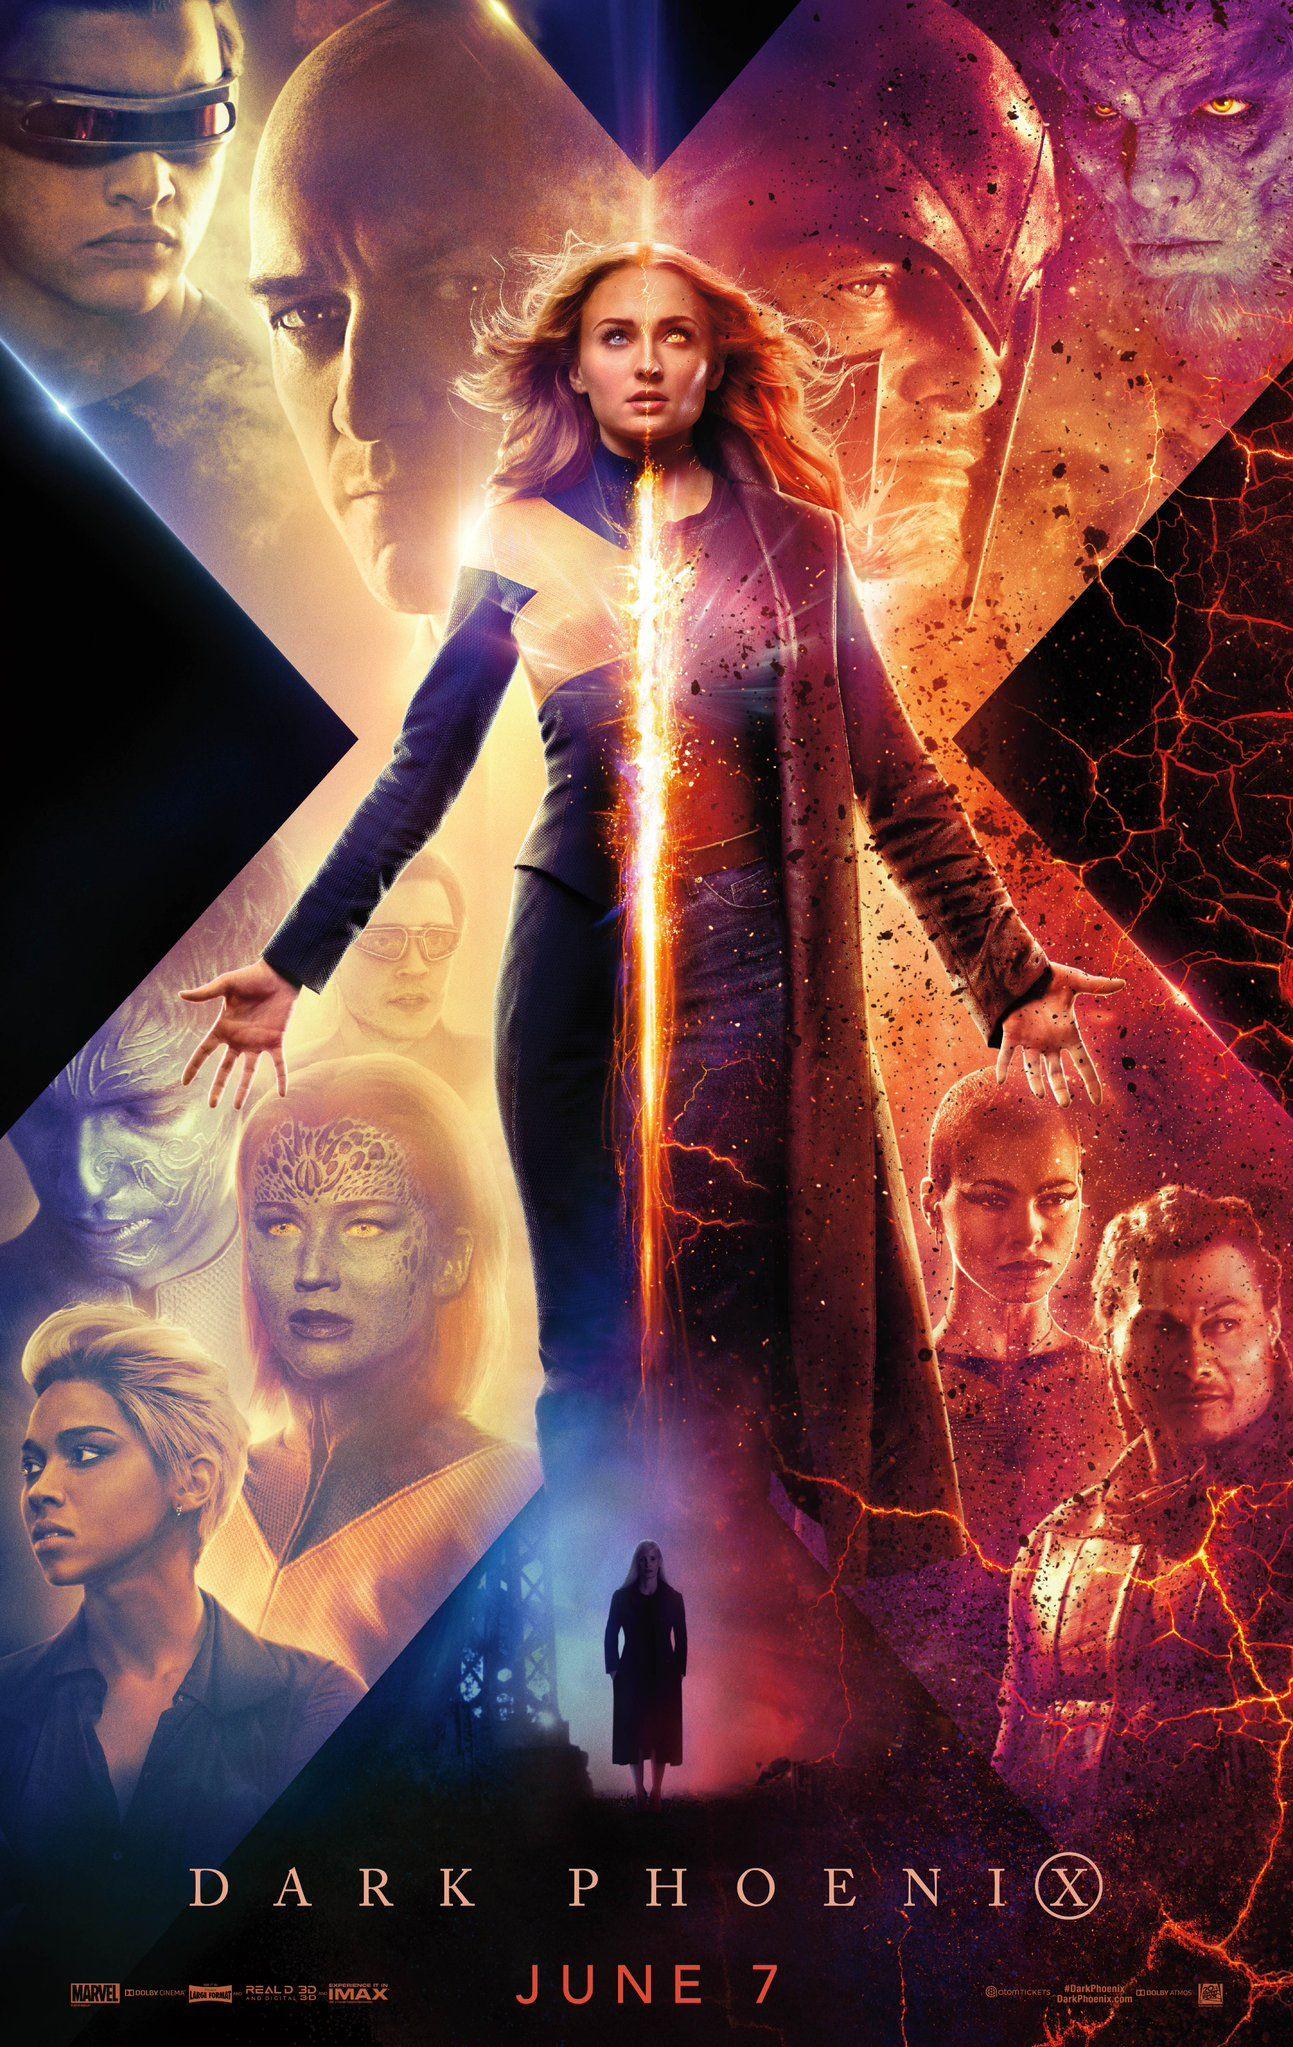 New X Men Dark Phoenix Poster Next Trailer Coming Wednesday Ign Dark Phoenix Full Movies Online Free X Men